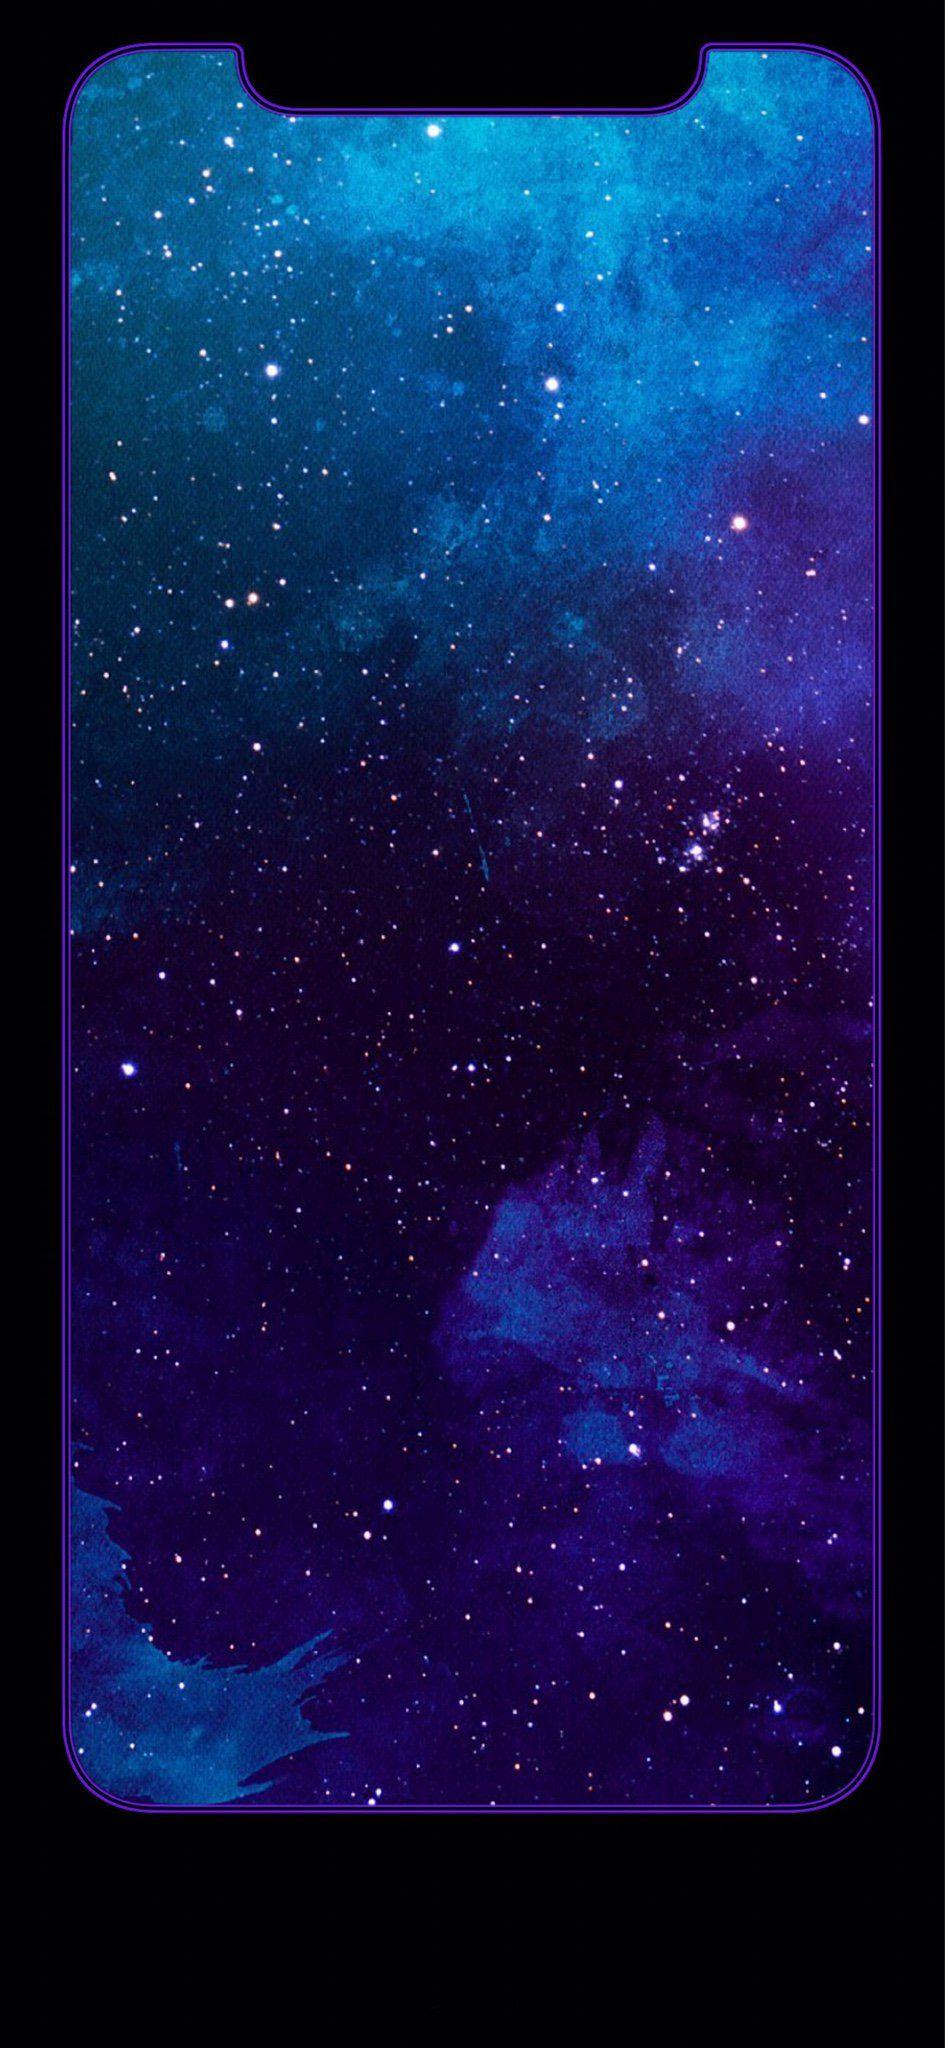 The Iphone X Xs Wallpaper Thread Page 41 Iphone Ipad Ipod